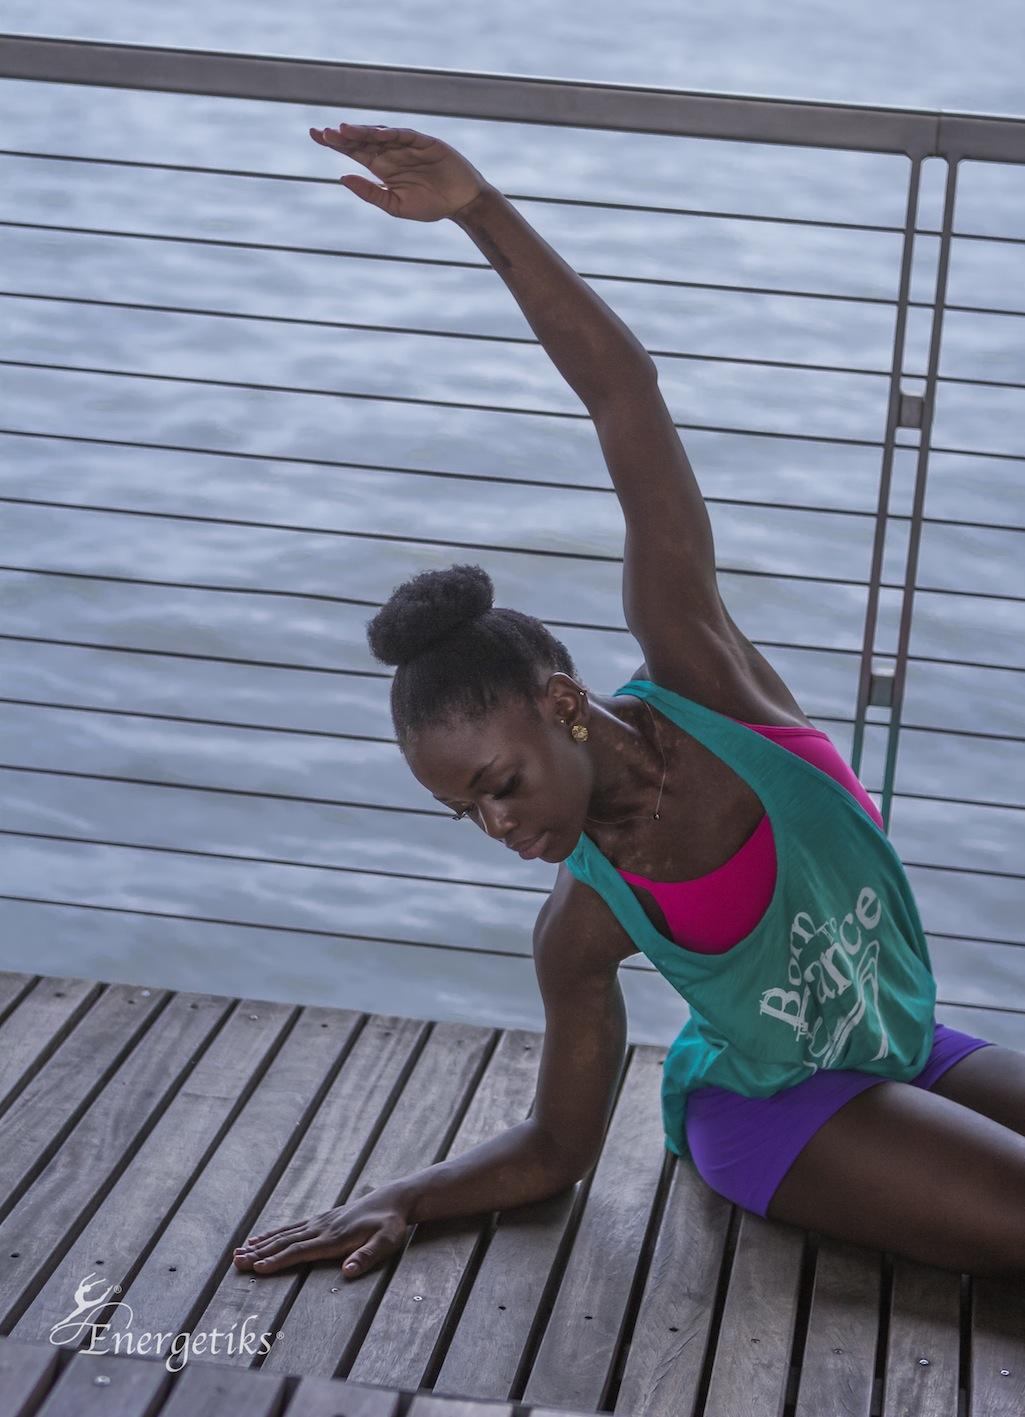 Michaela wears Energetiks Flow Dance Singlet, T Back Crop Top and Straight Band Short